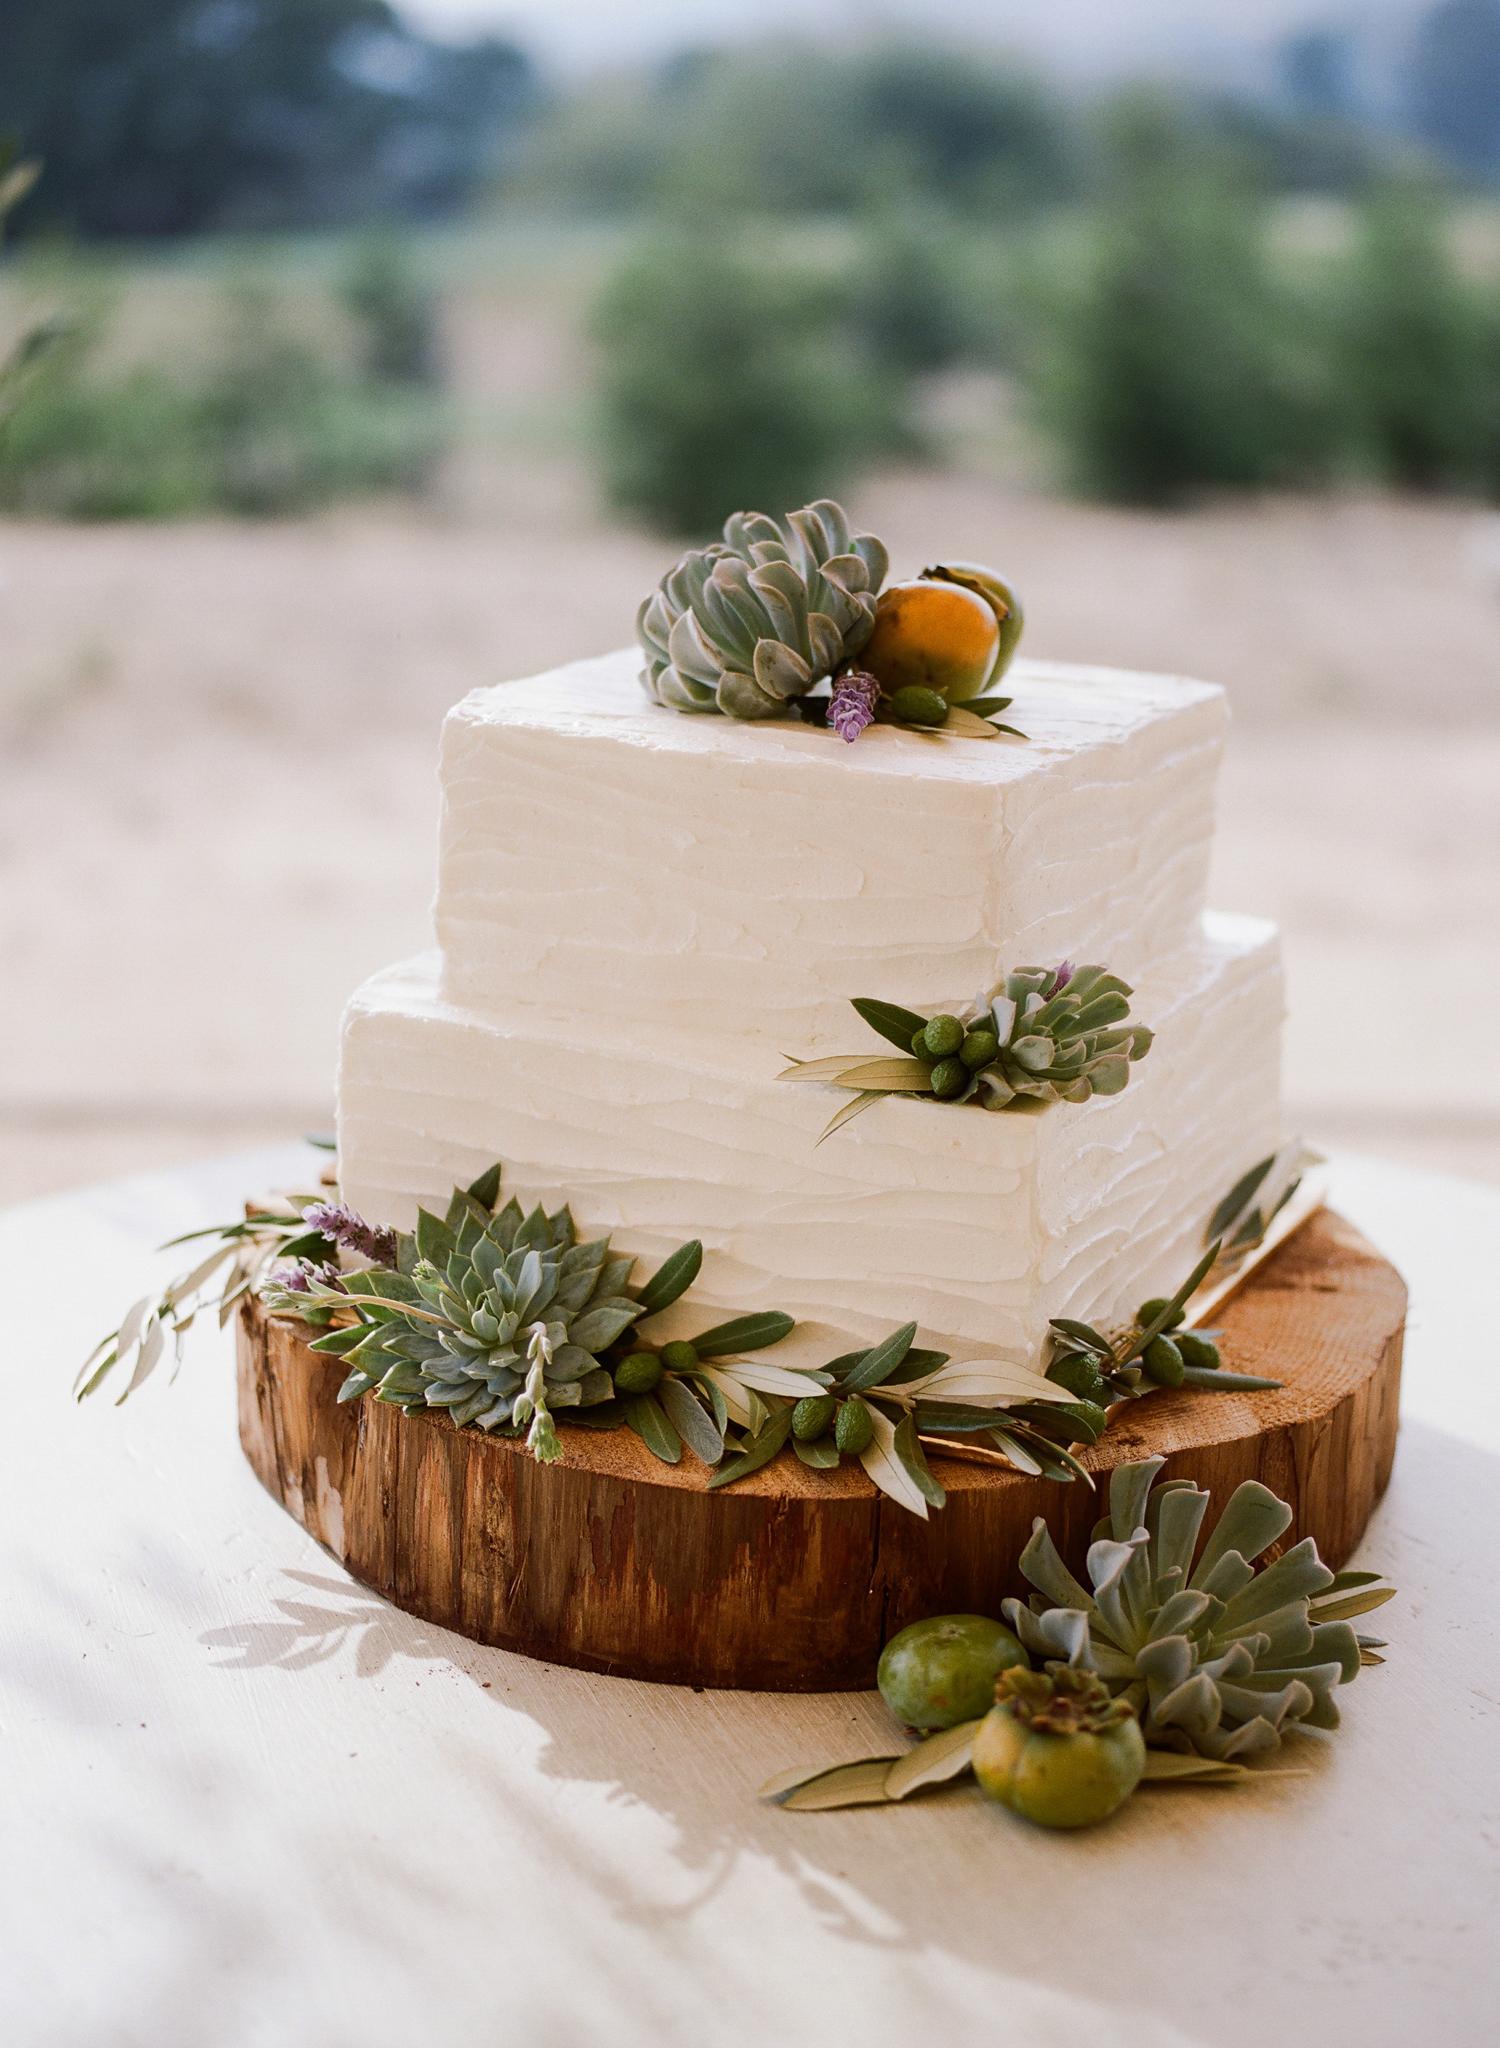 24-square-rustic-cake.jpg